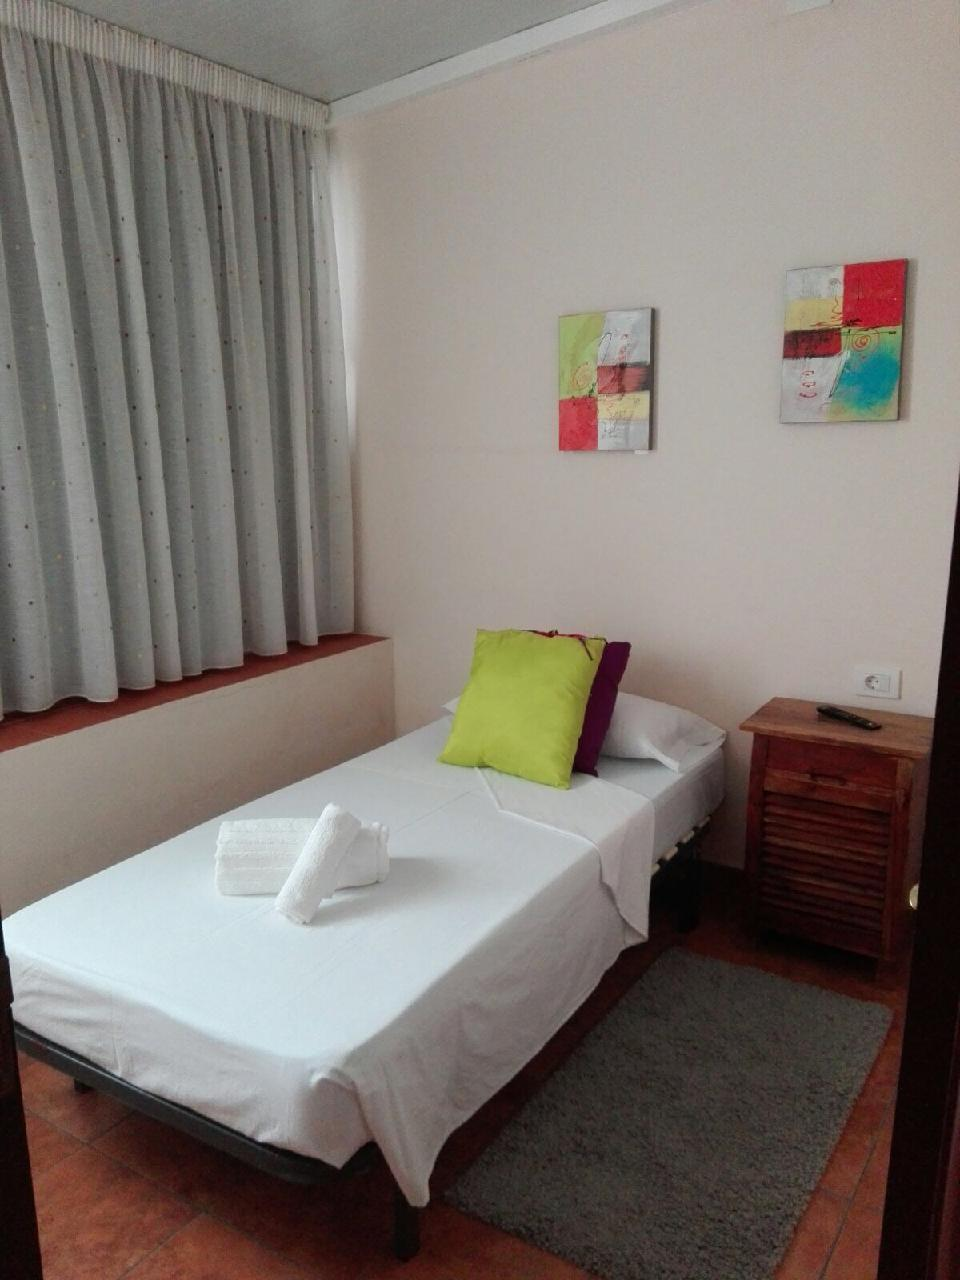 Appartement de vacances WOHN SPRING (2231371), Arona (ES), Ténérife, Iles Canaries, Espagne, image 30